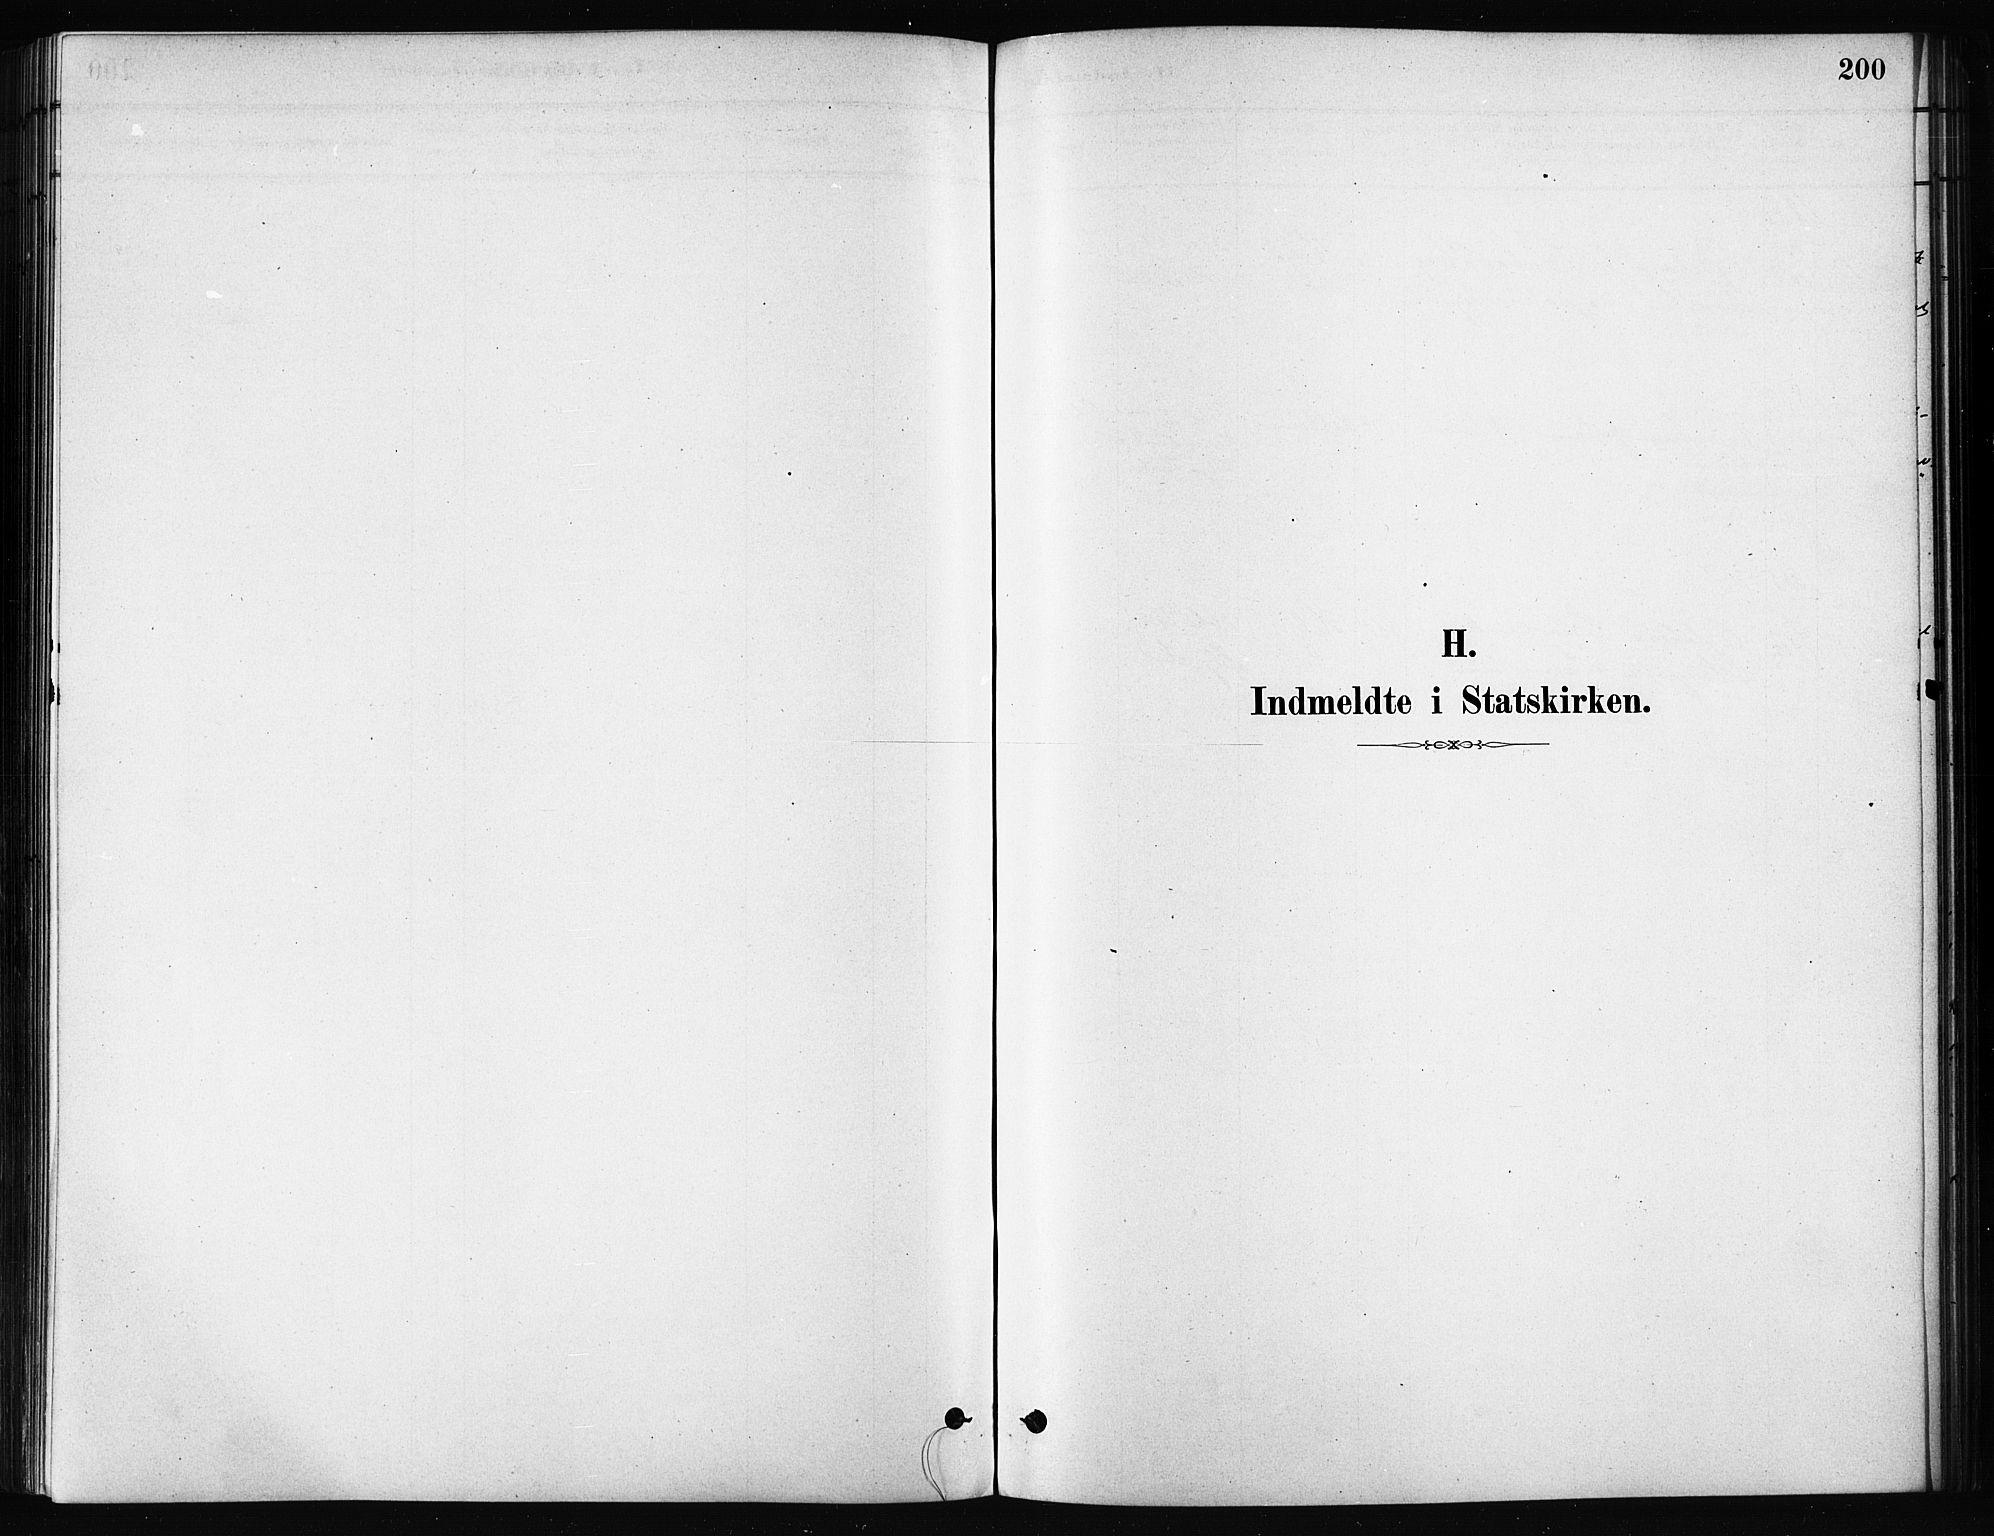 SATØ, Karlsøy sokneprestembete, H/Ha/Haa/L0011kirke: Ministerialbok nr. 11, 1879-1892, s. 200